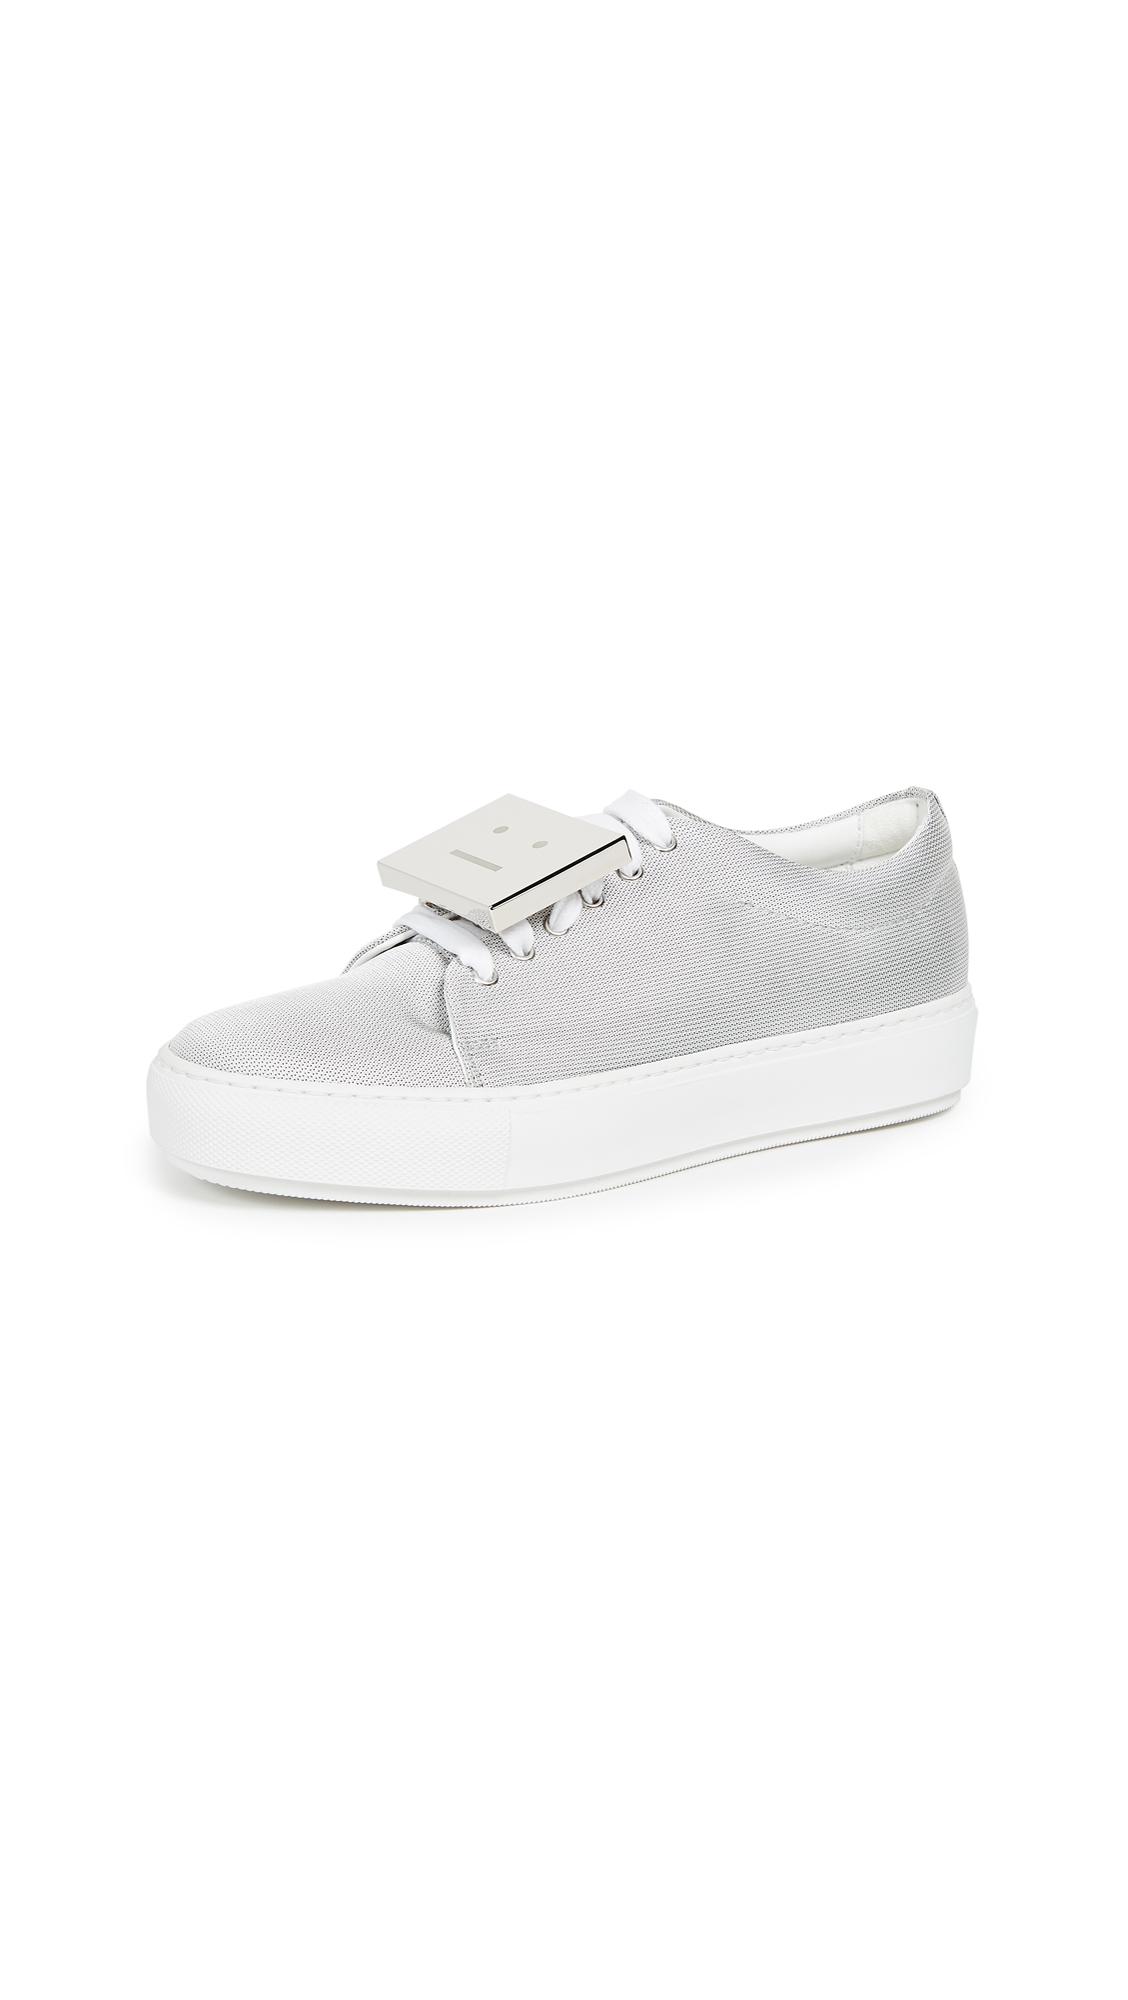 Acne Studios Adriana Mesh Sneakers - Silver